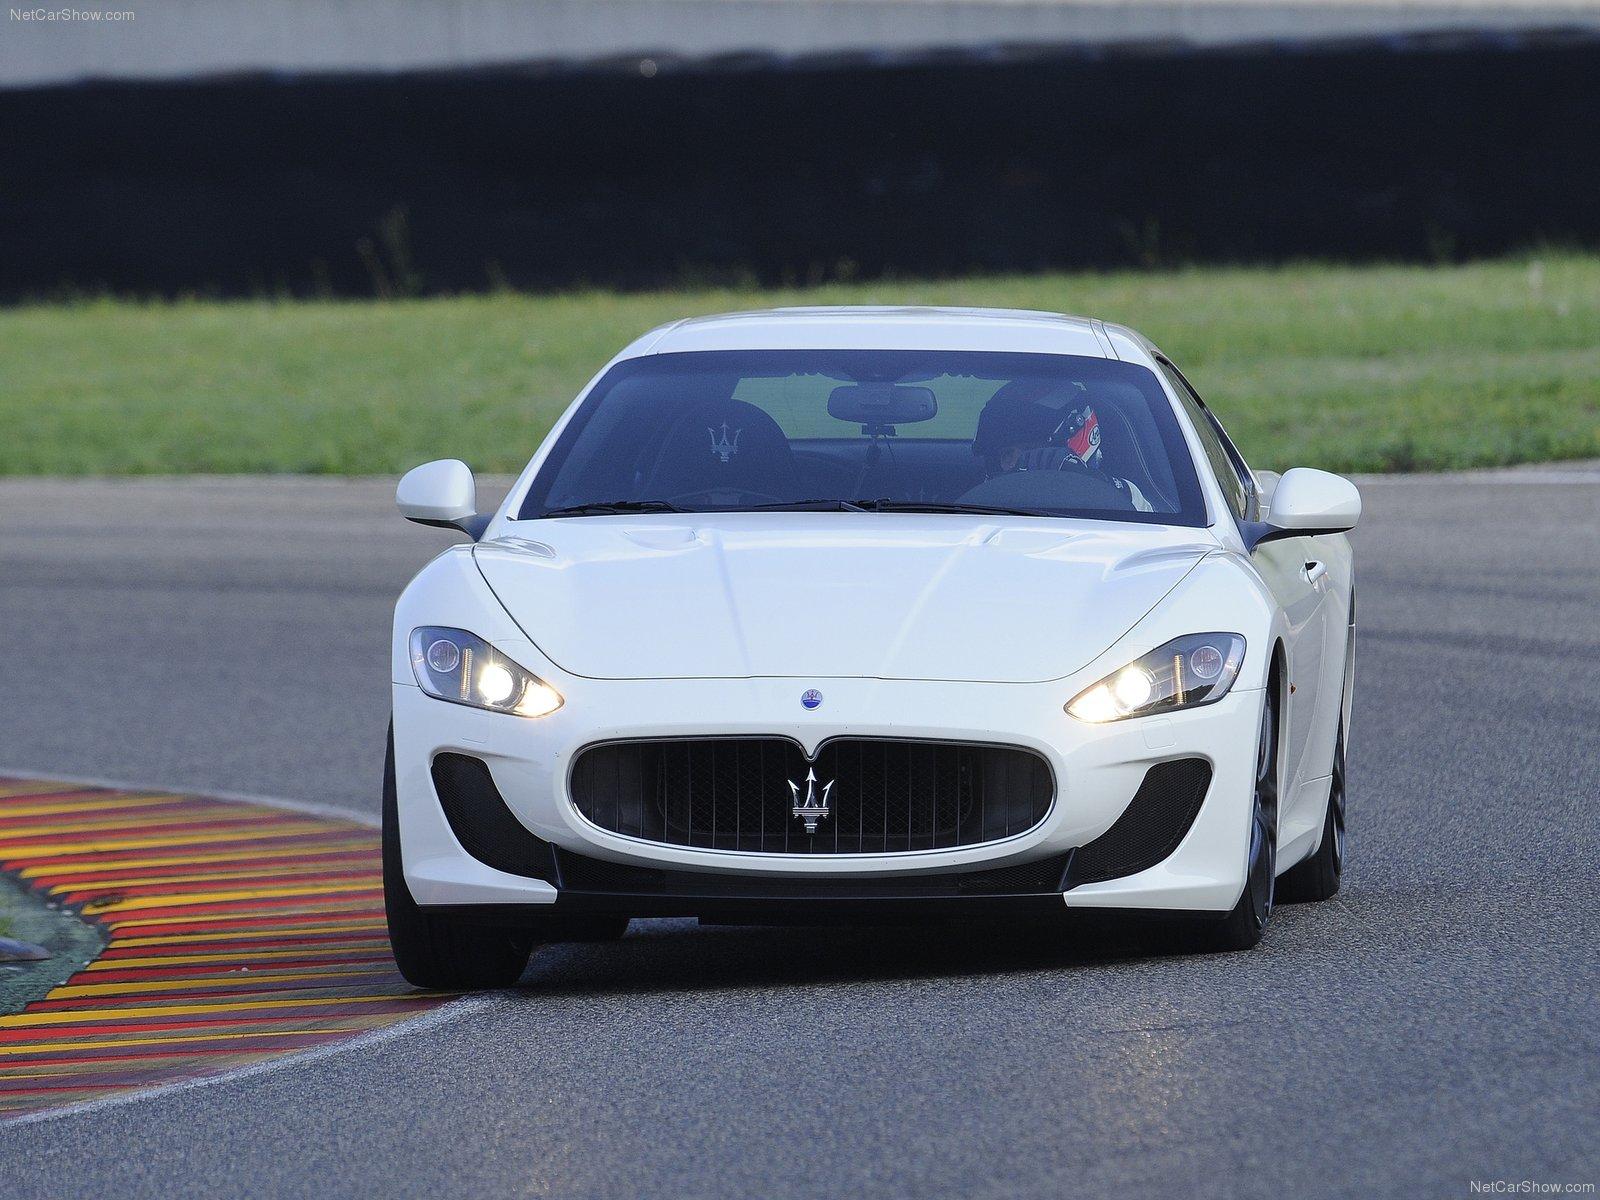 Hình ảnh siêu xe Maserati GranTurismo MC Stradale 2012 & nội ngoại thất